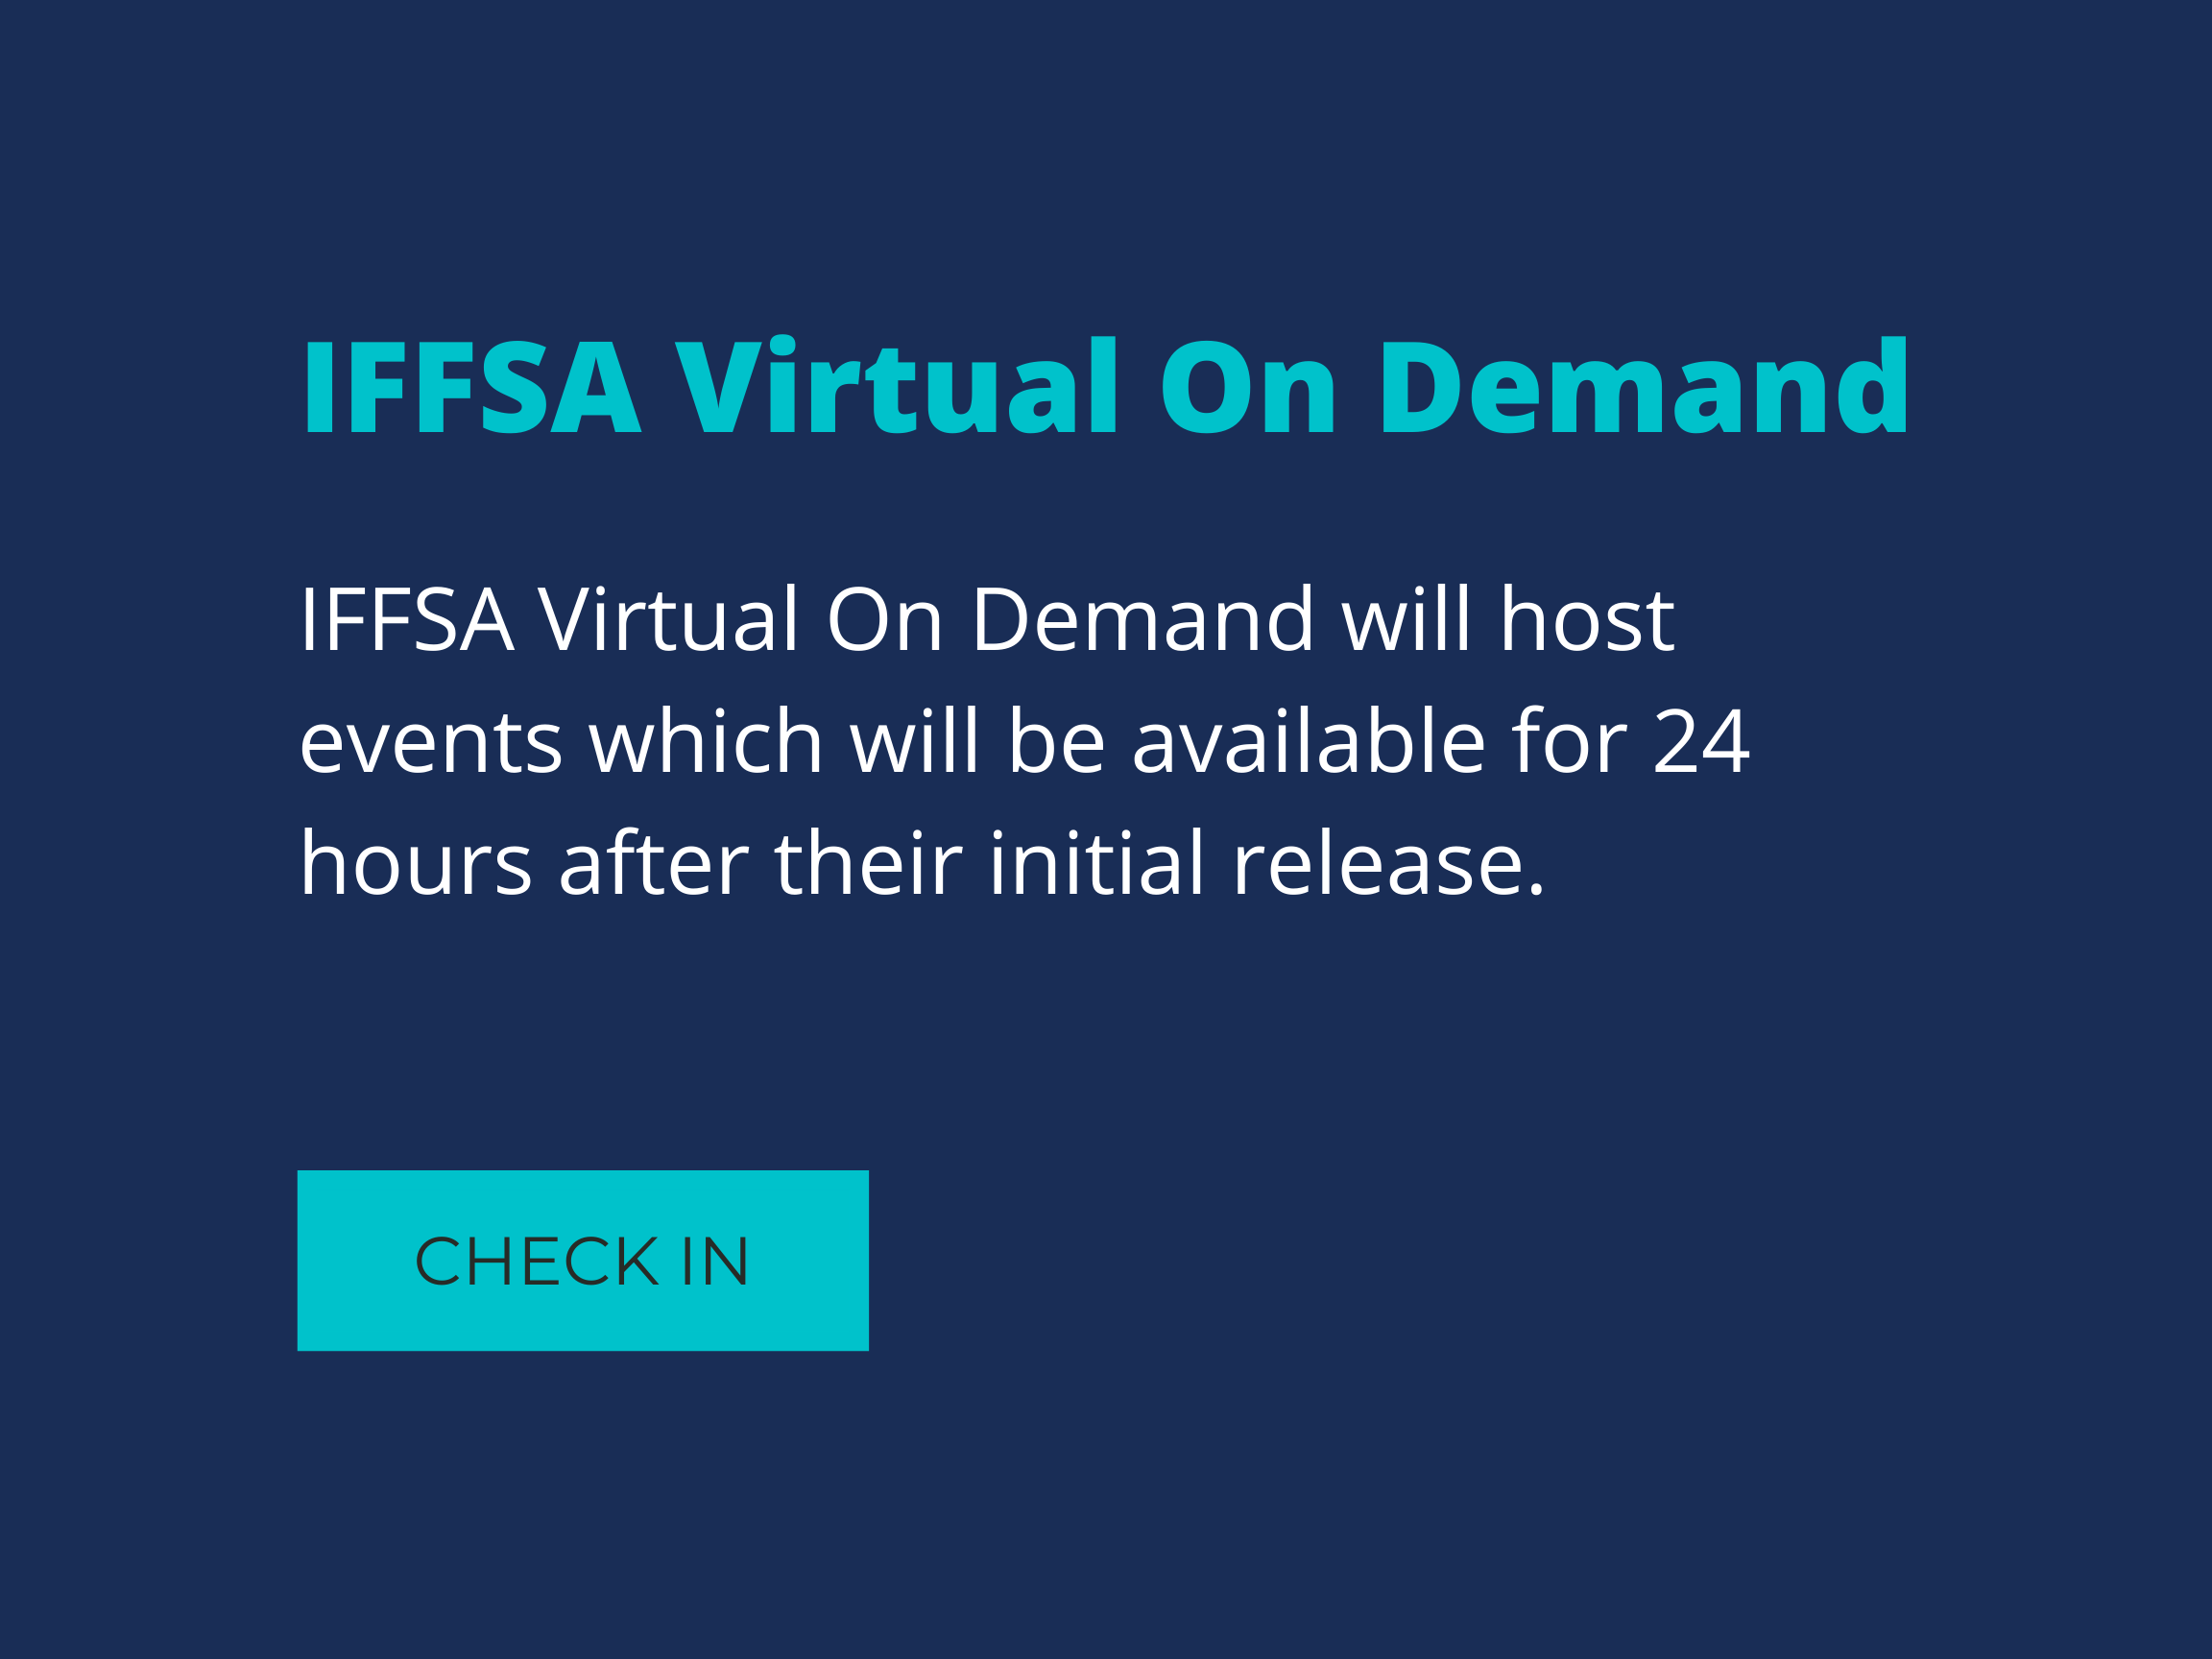 IFFSA Virtual